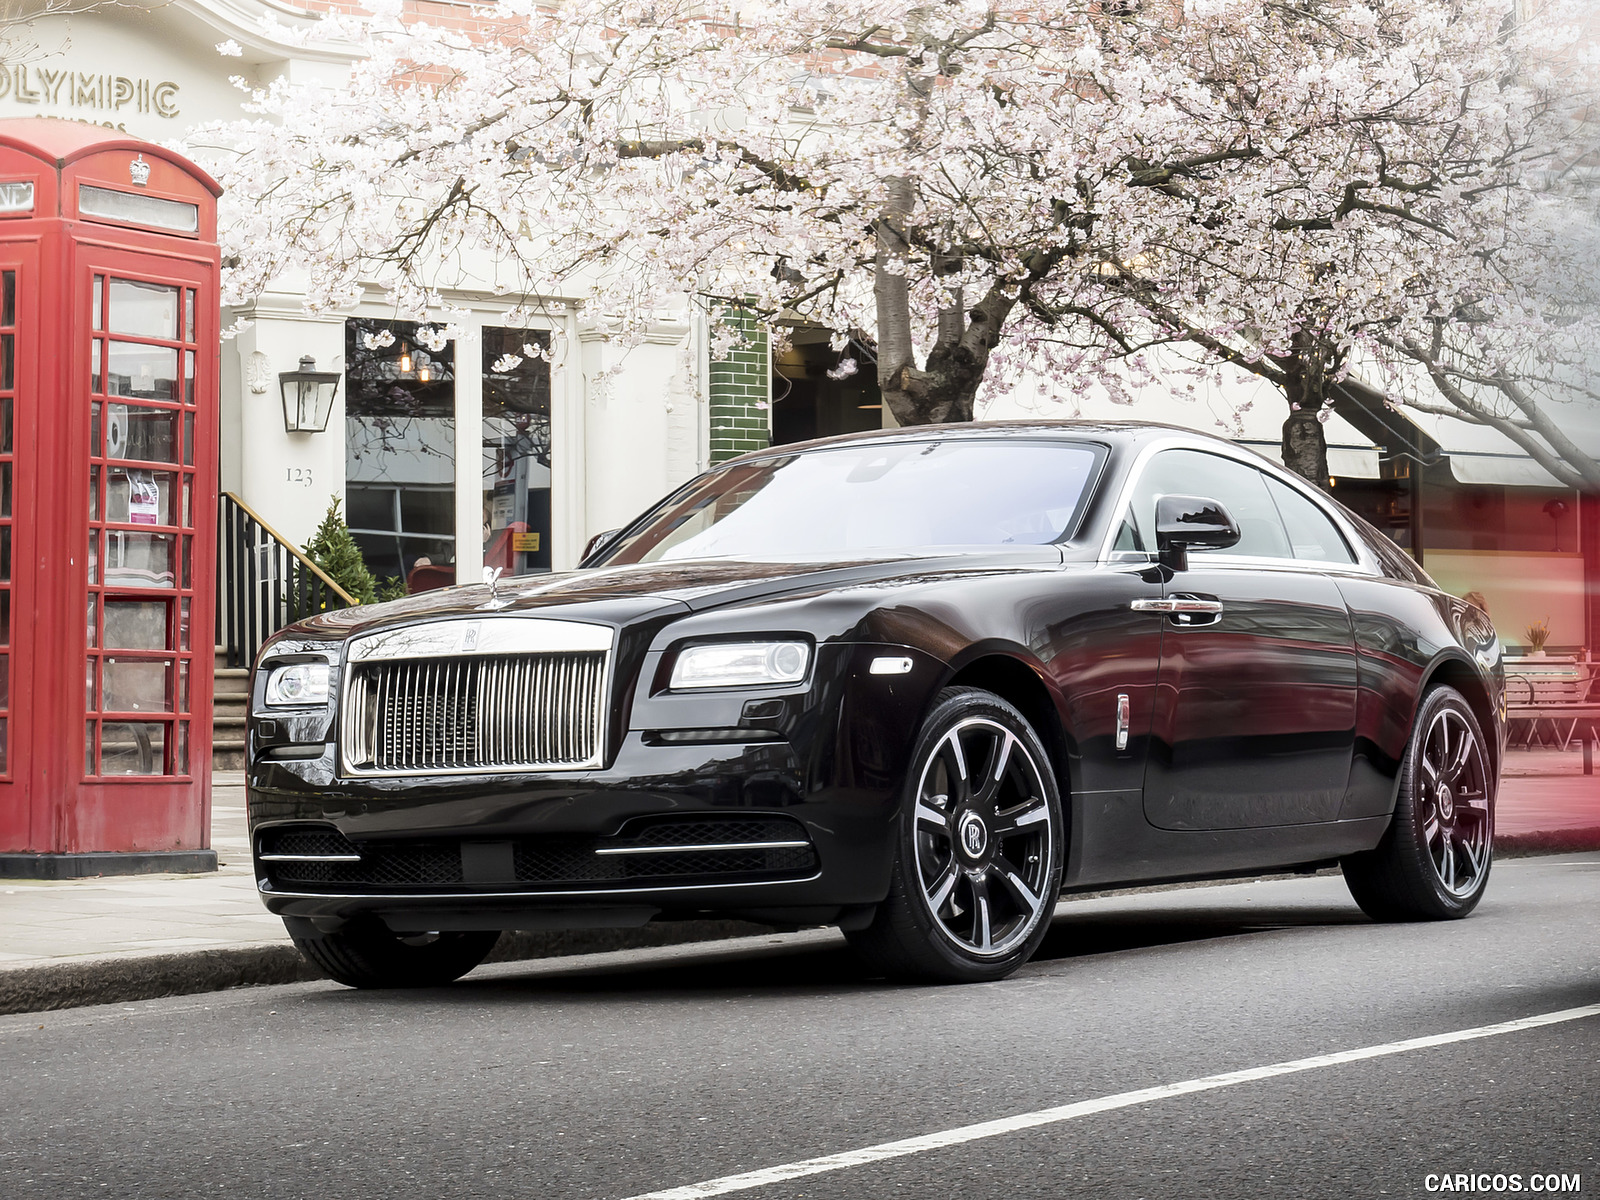 2017 Rolls Royce Wraith Inspired by British Music   Ronnie Wood 1600x1200